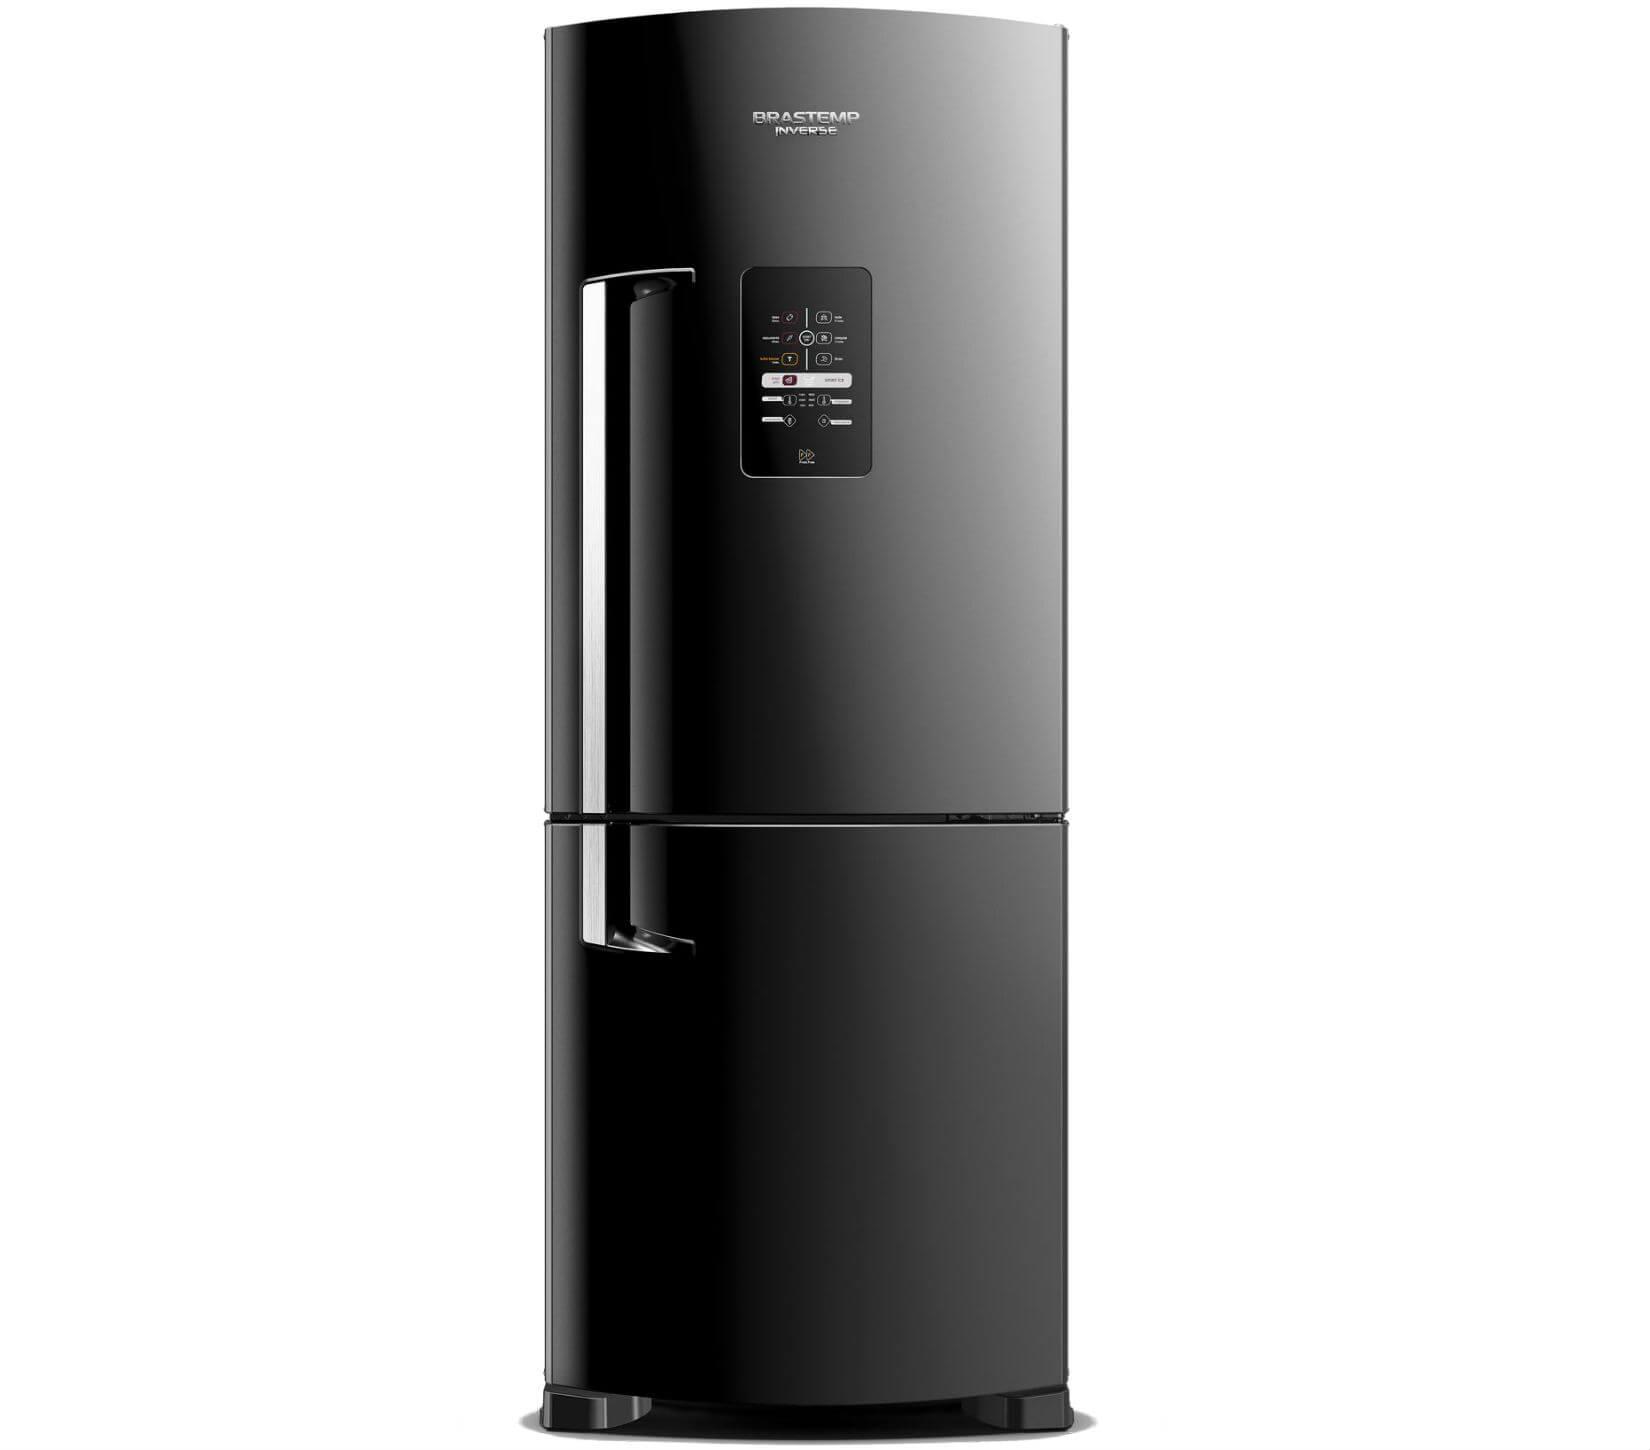 Geladeira Brastemp Frost Free Inverse 422 litros Preto com Smart Ice